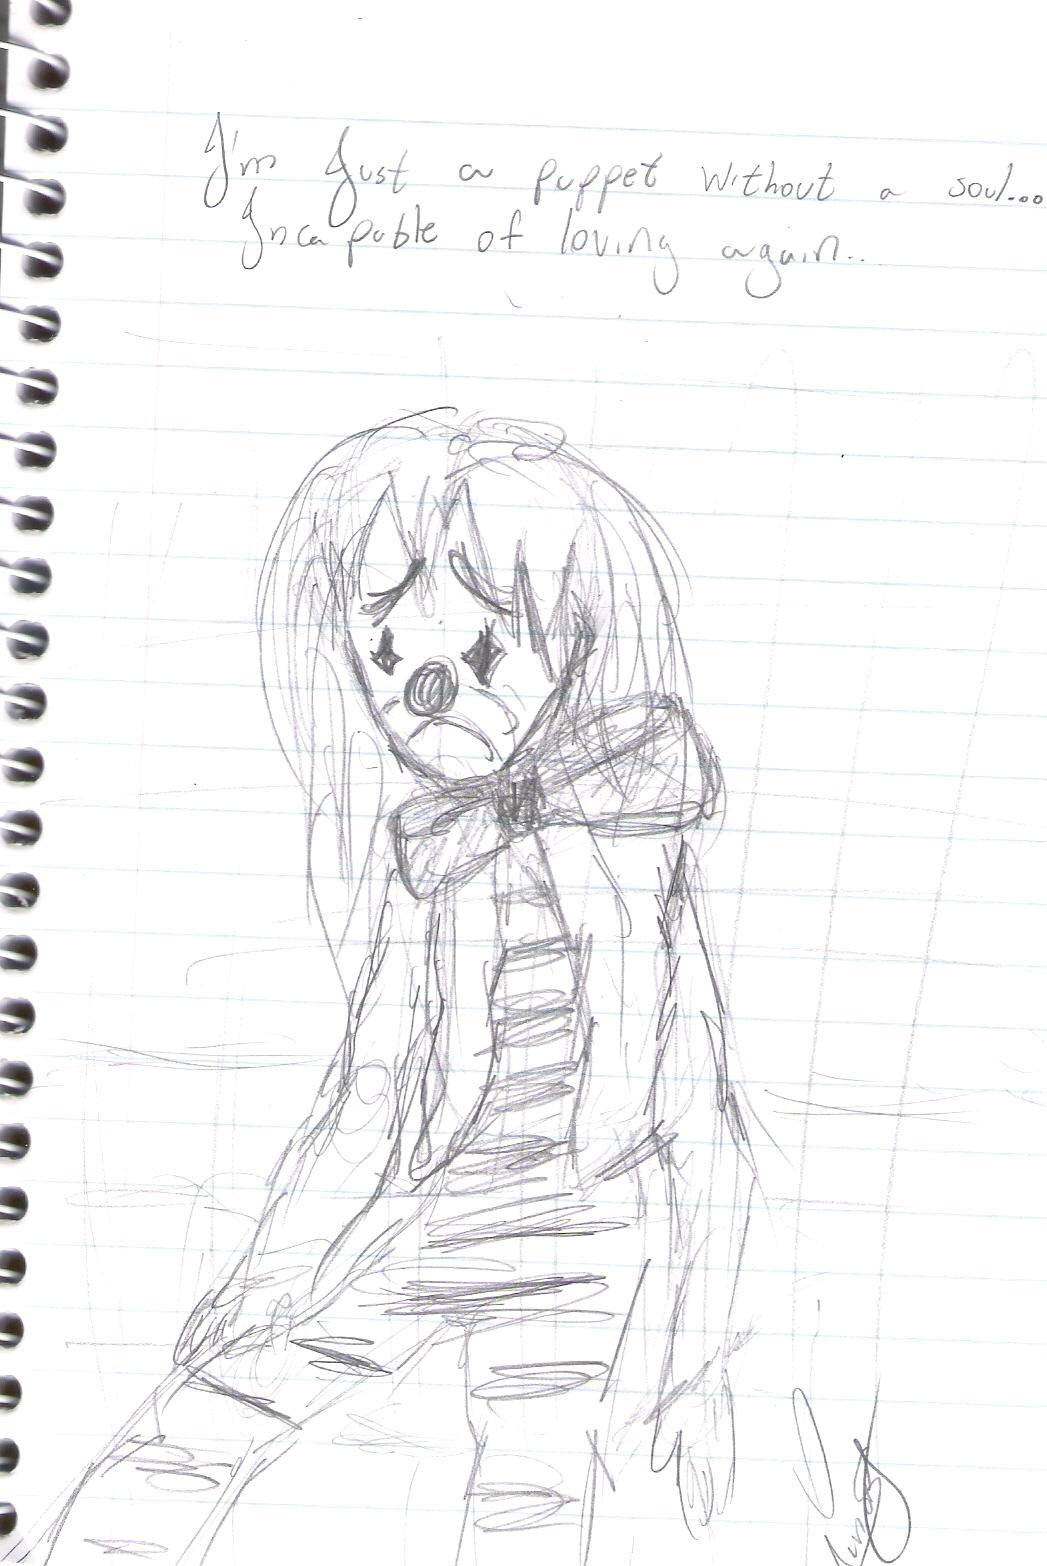 Nerd Sedentario Desenho Triste